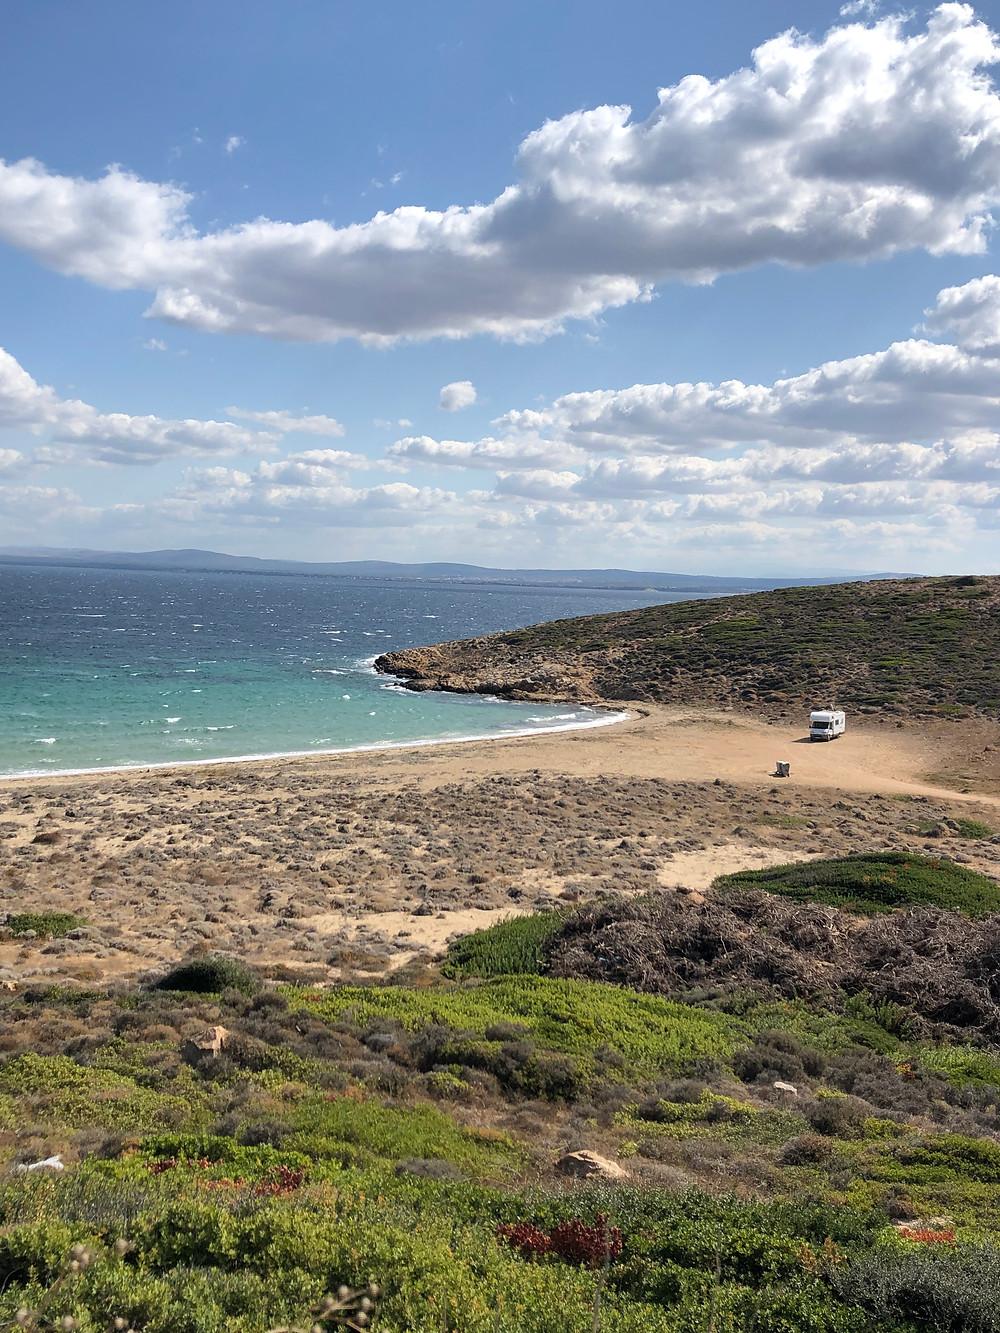 Akvaryum Bozcaada beaches and coves on Tenedos island Turkey